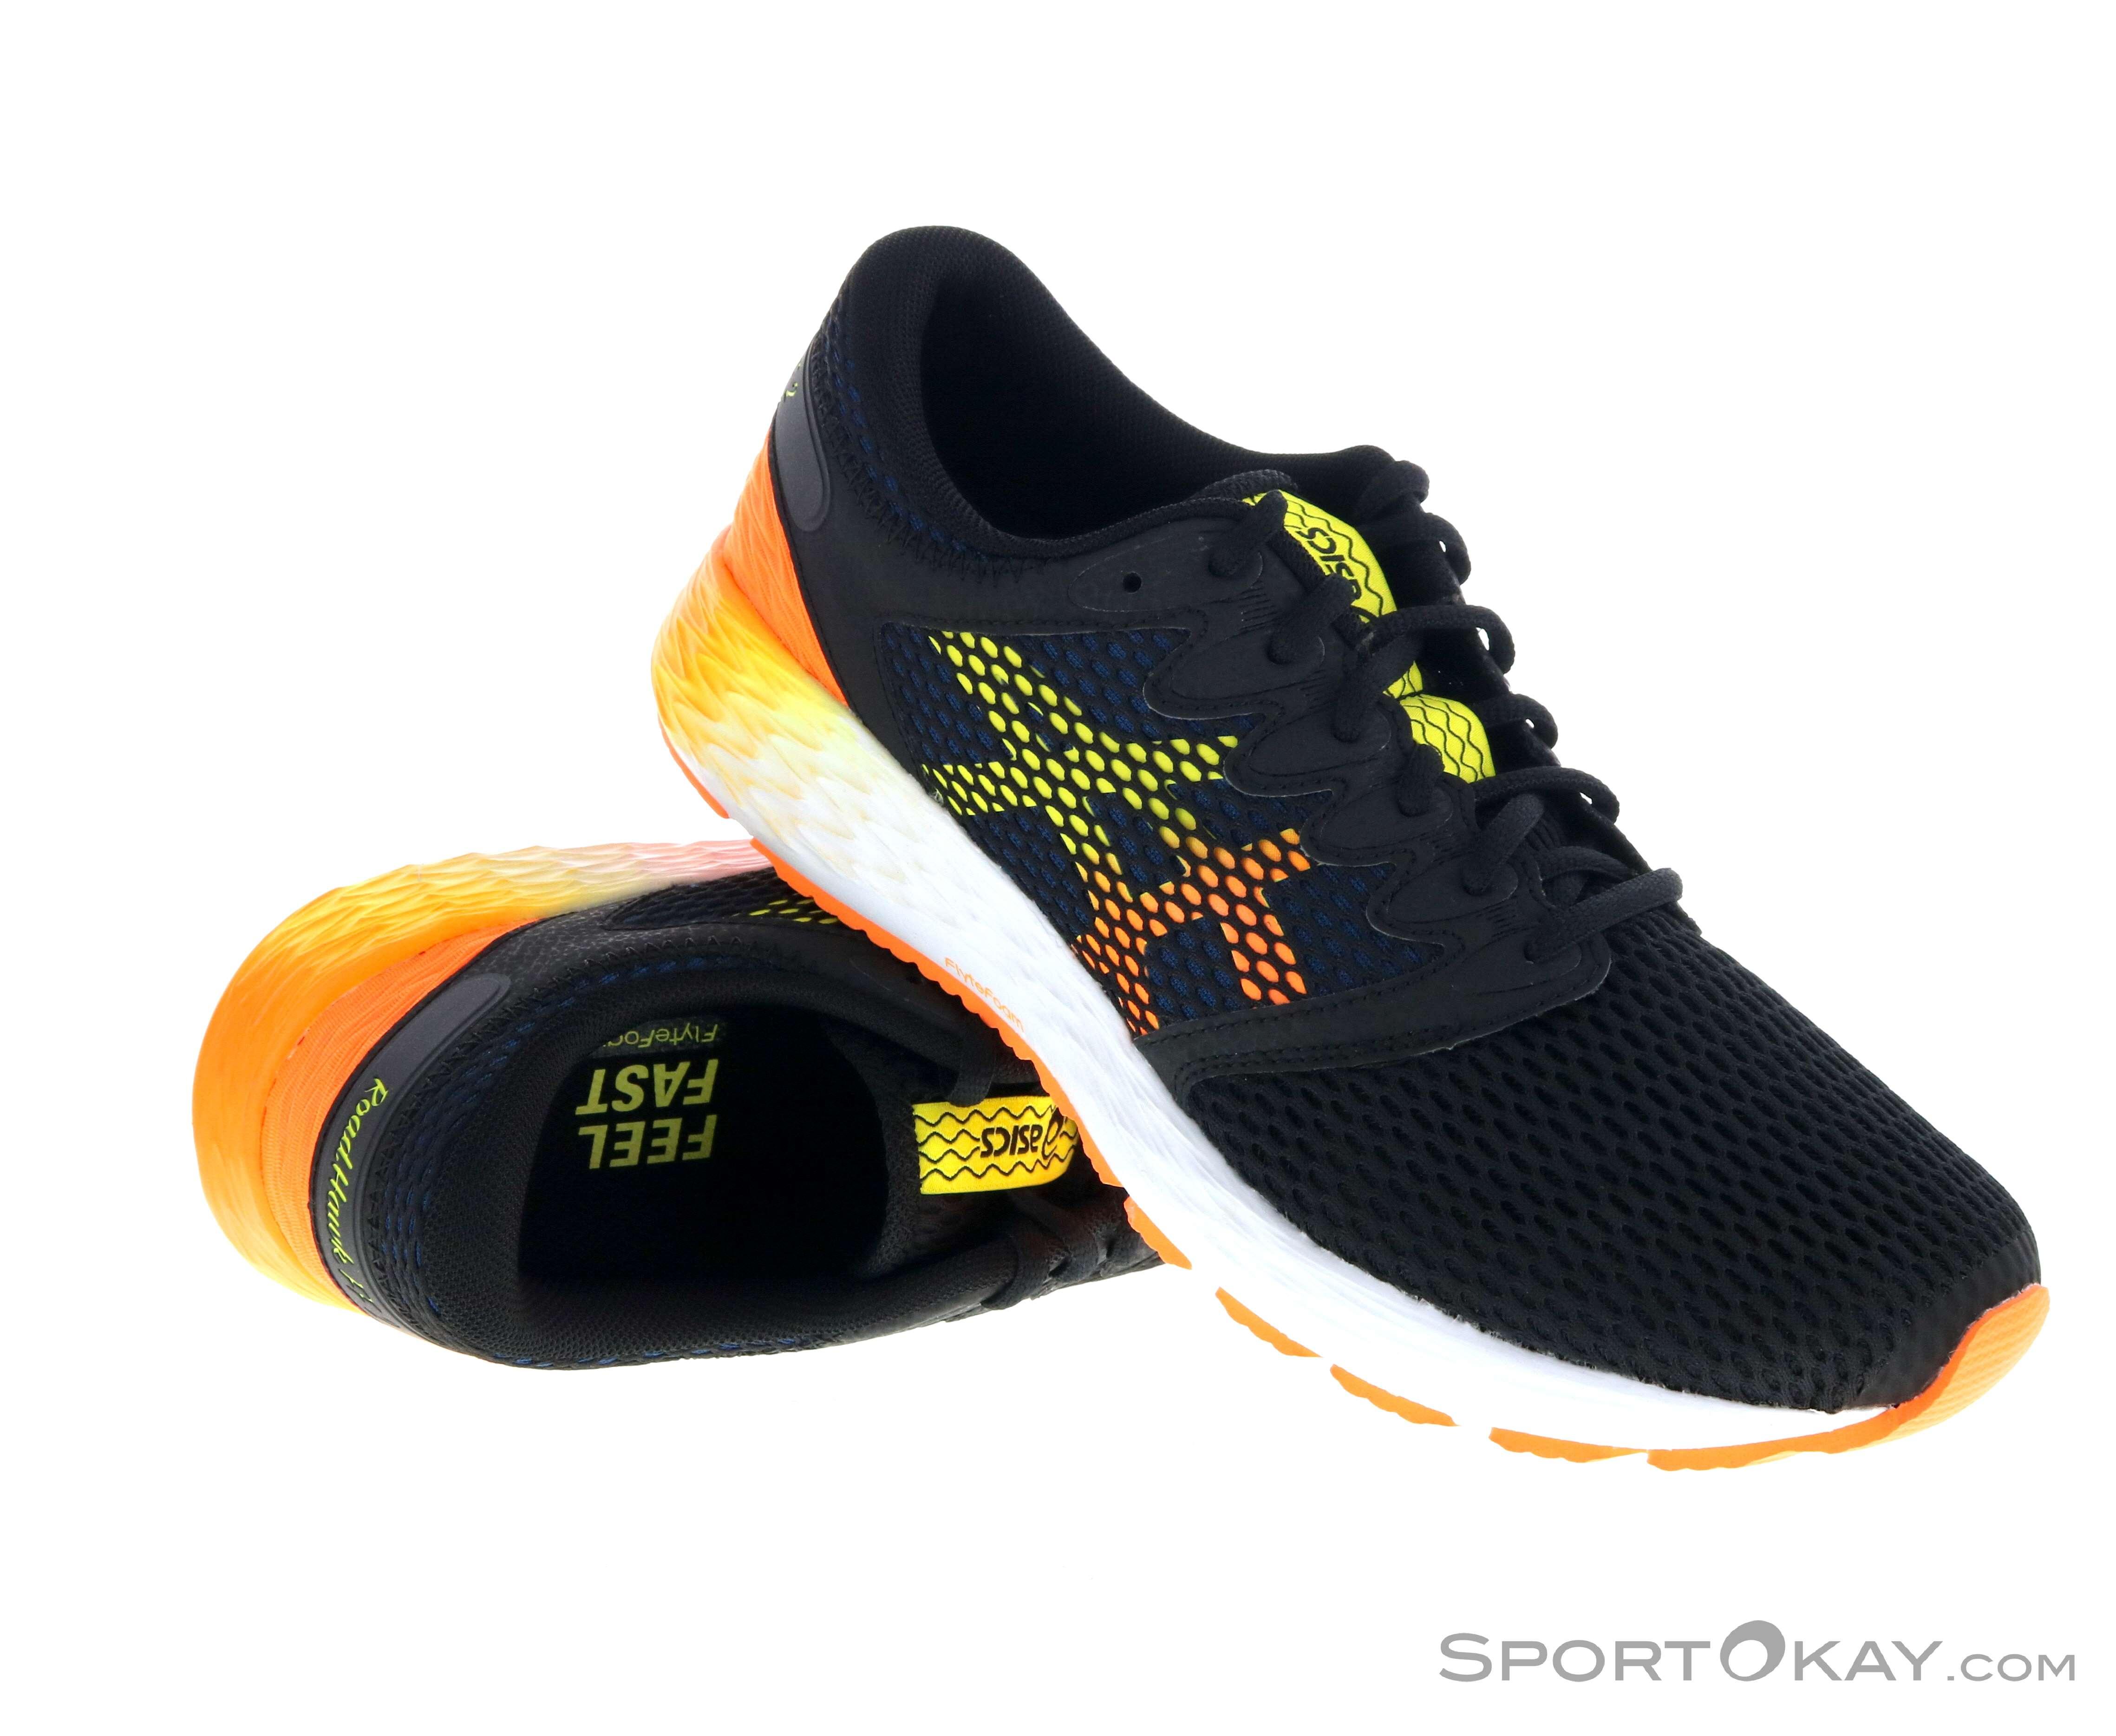 Asics Asics Roadhawk FF2 Mens Running Shoes